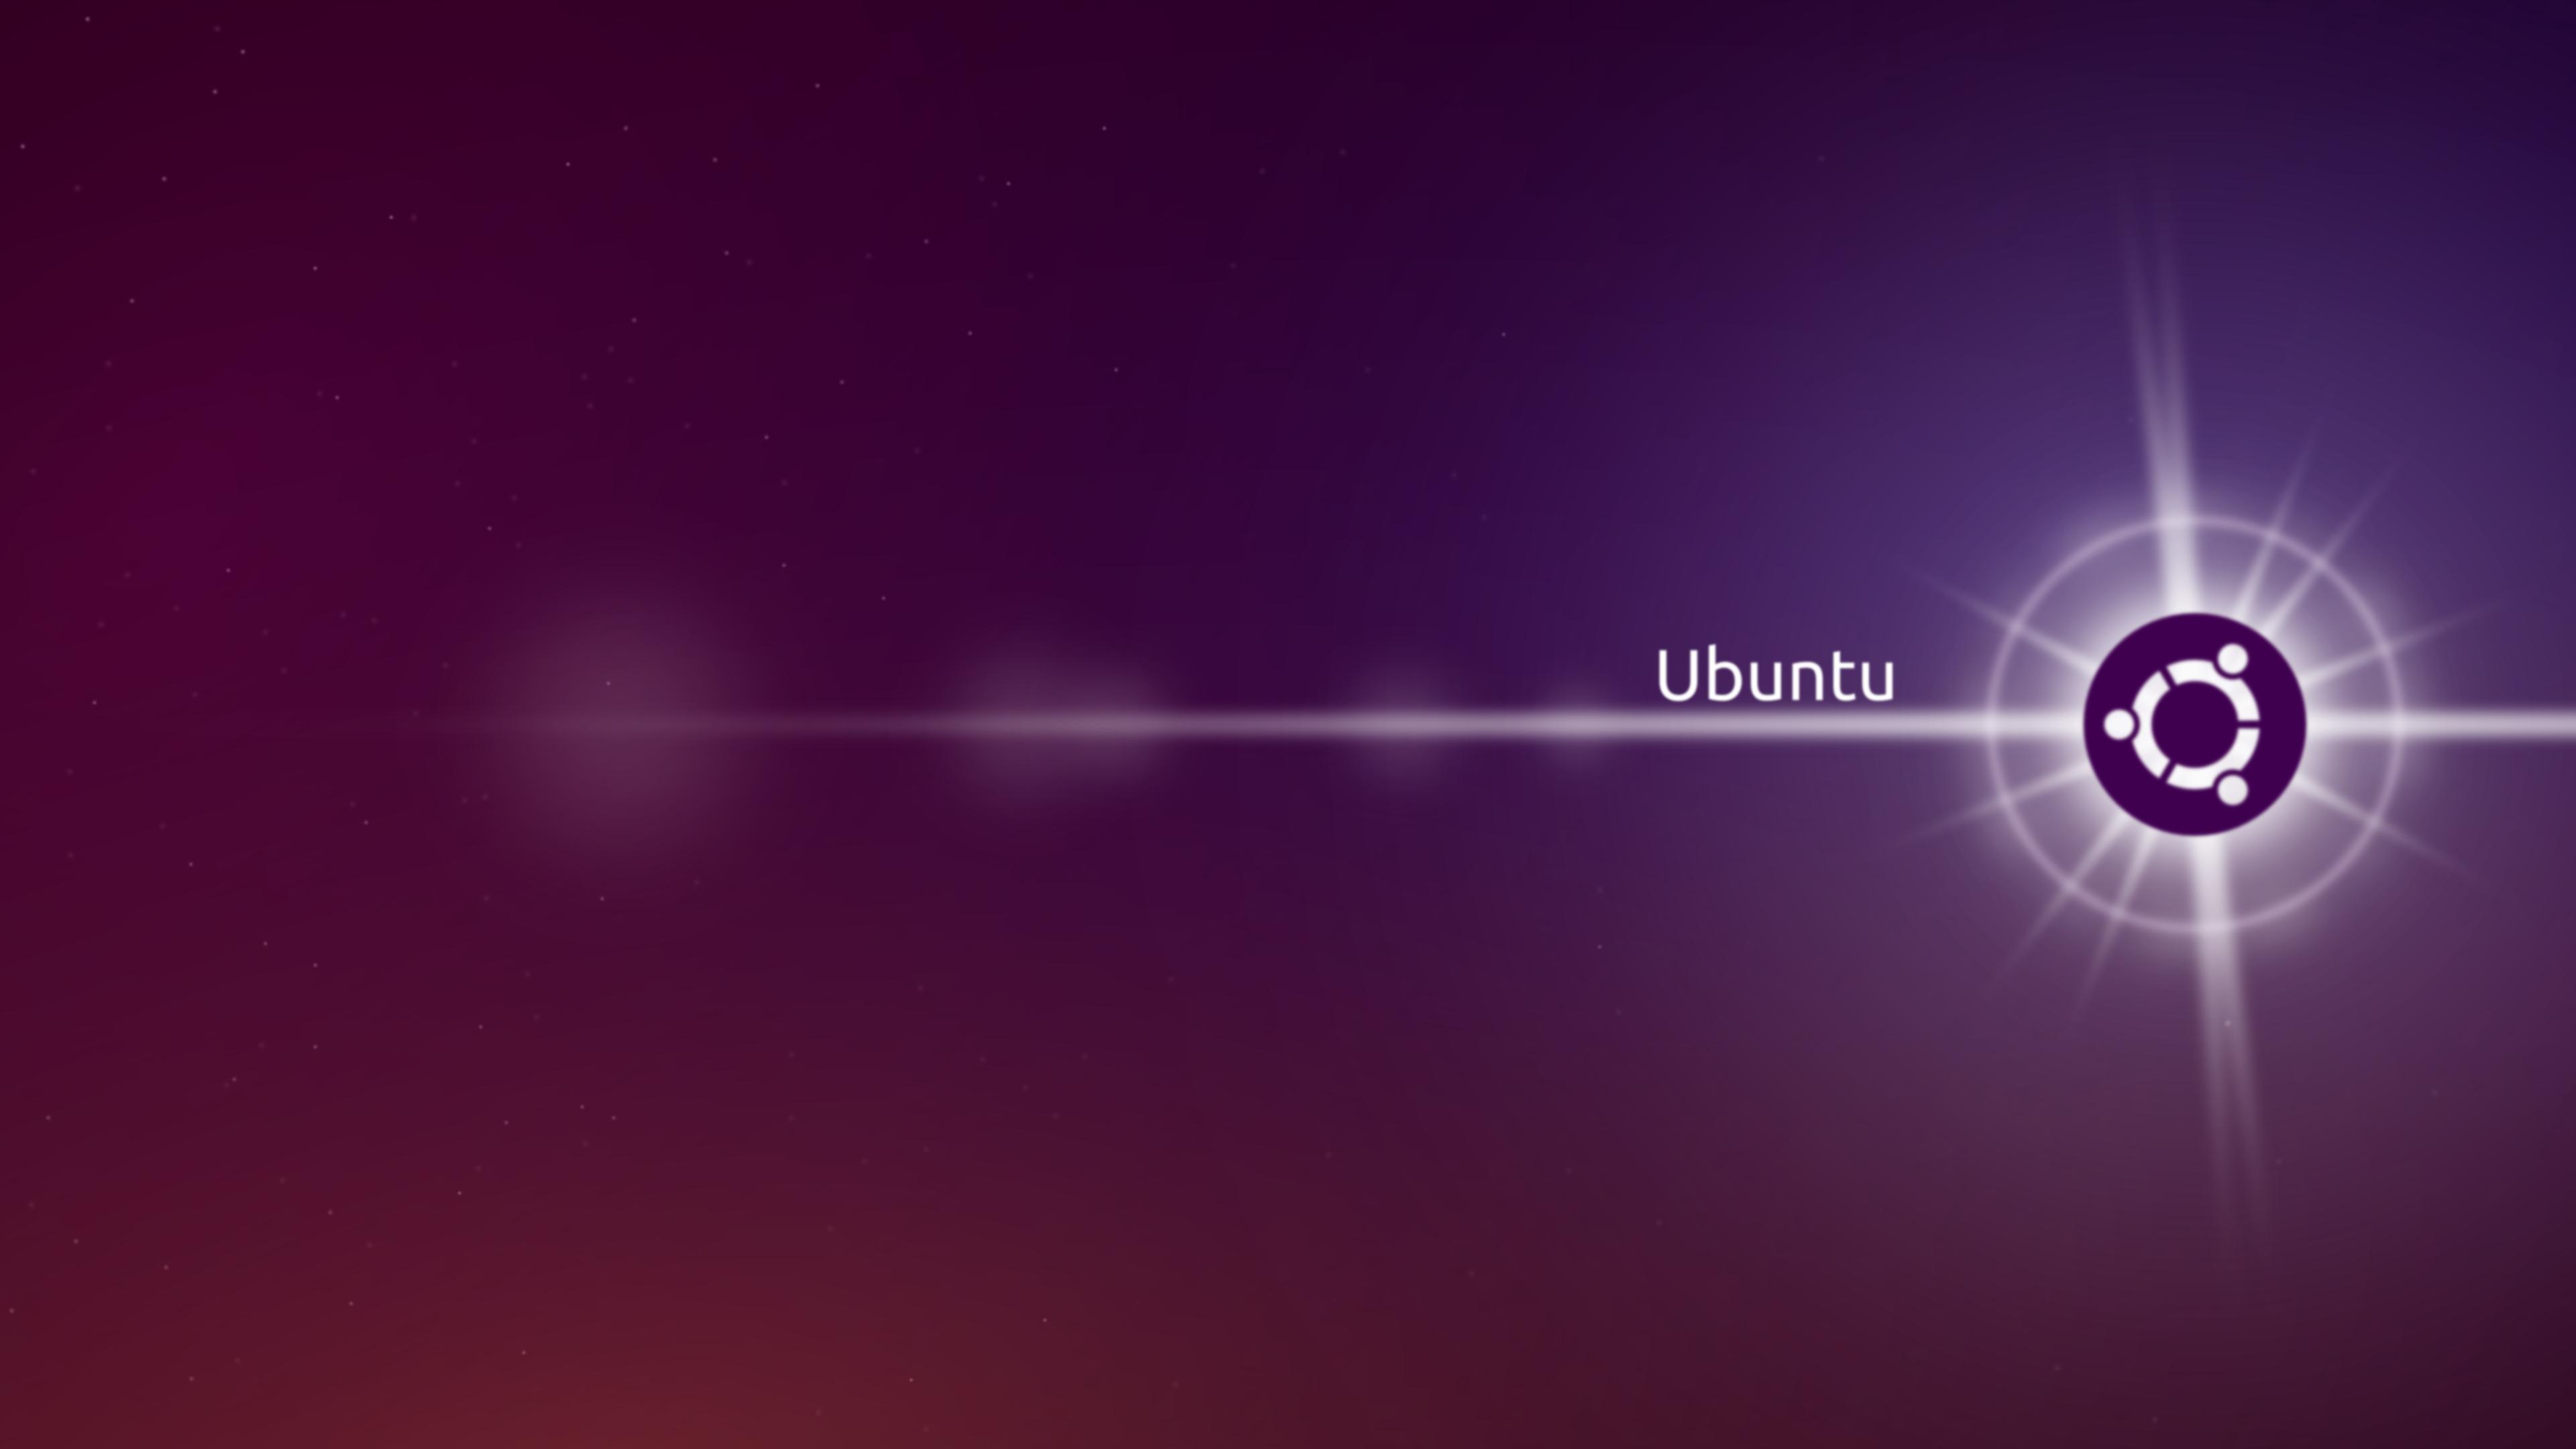 Ubuntu Wallpapers HD 3840x2160